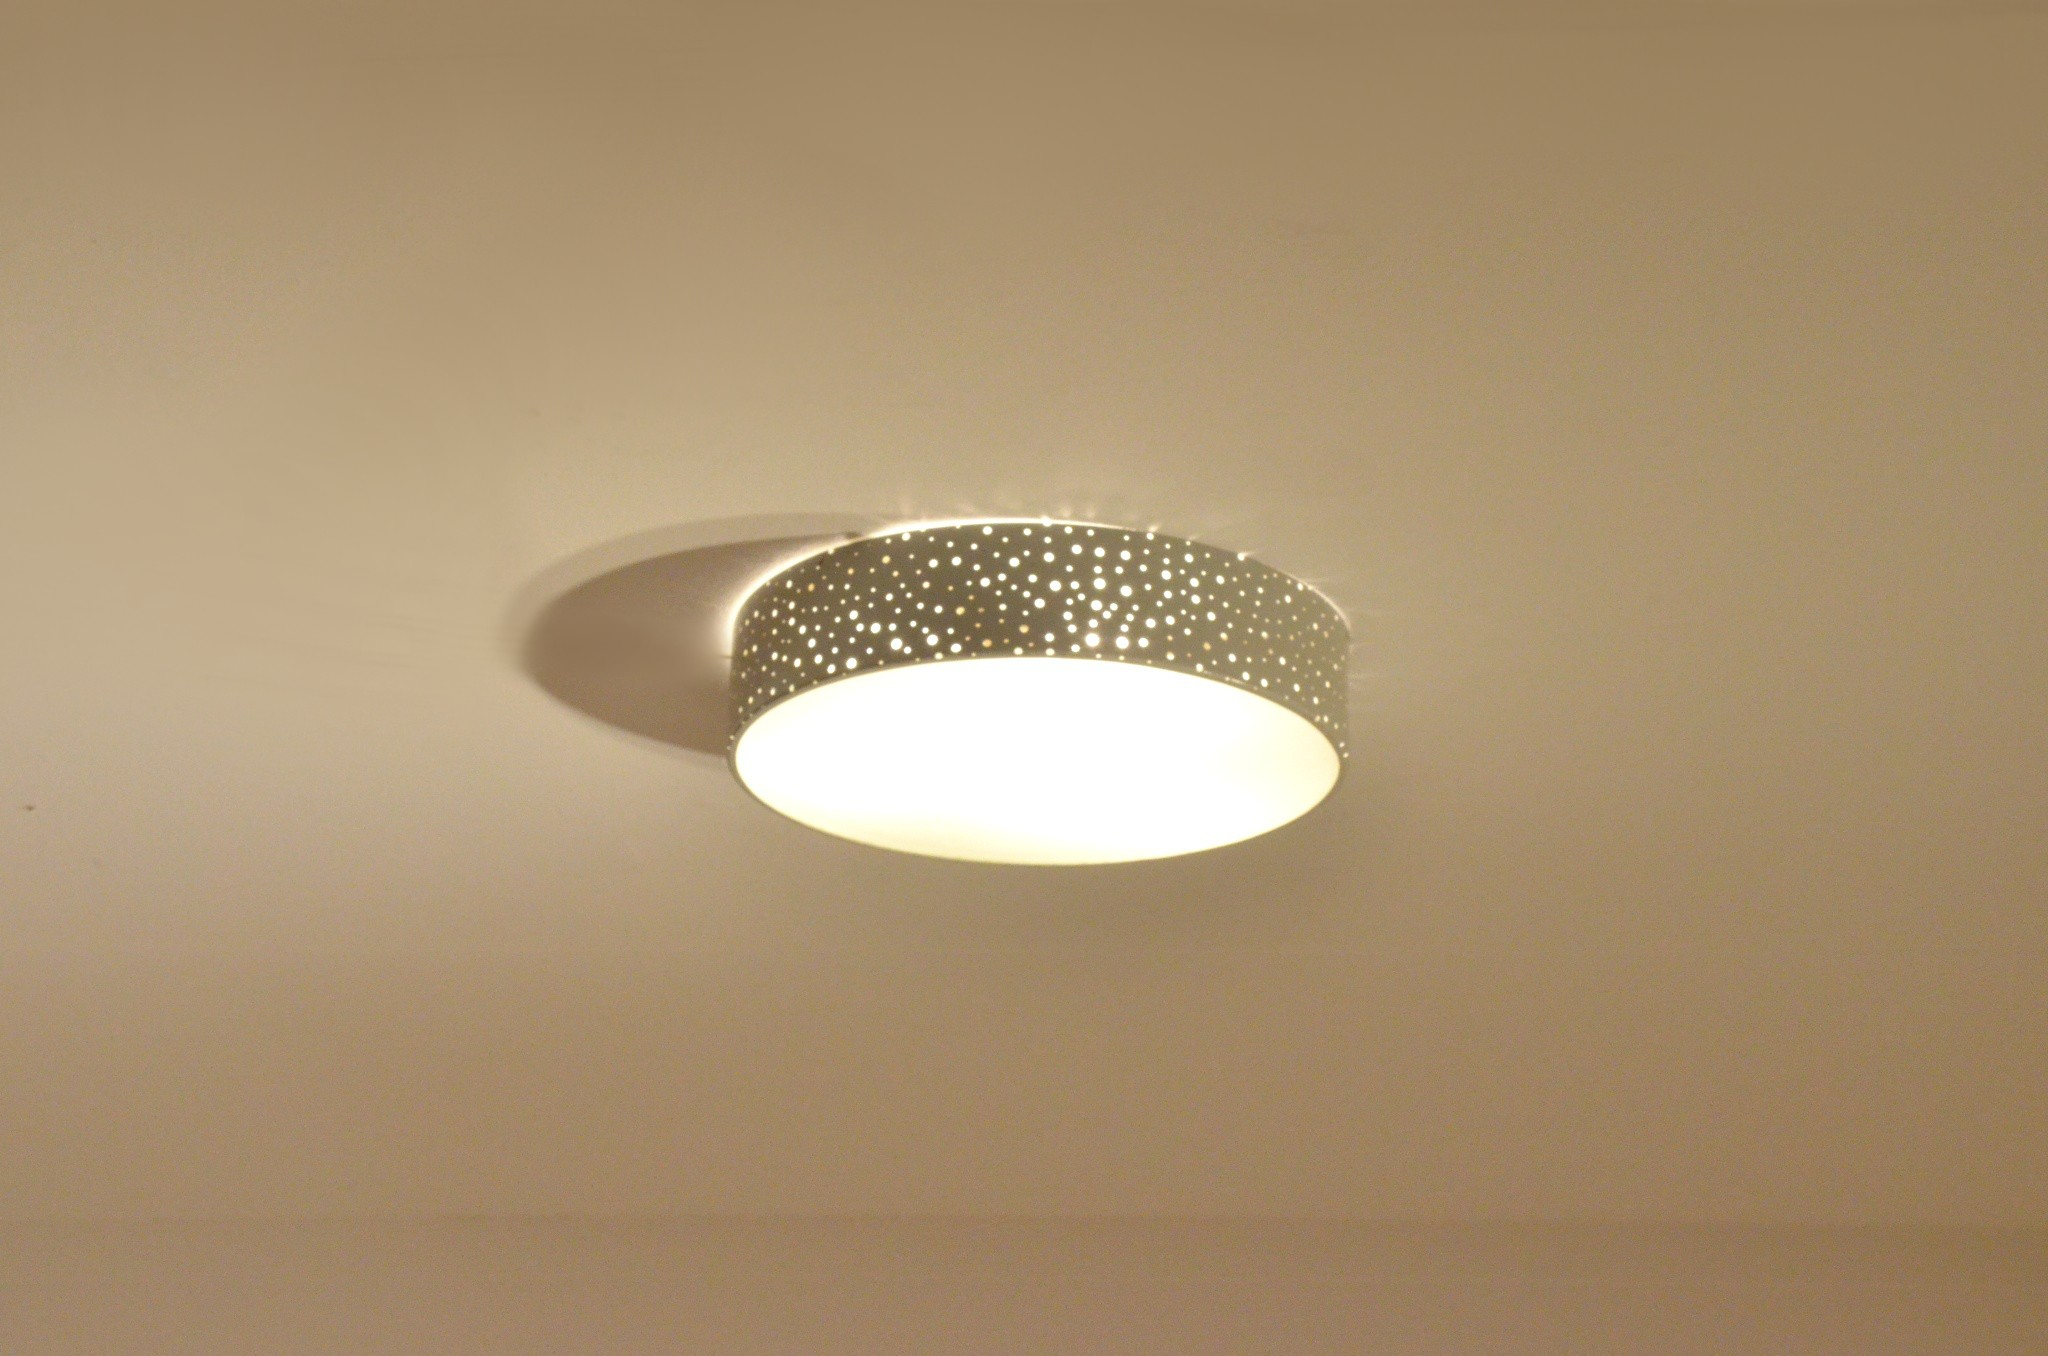 Kristallen Plafonniere : Plafonniere design lamp: plafonnier salle de bain luminaire